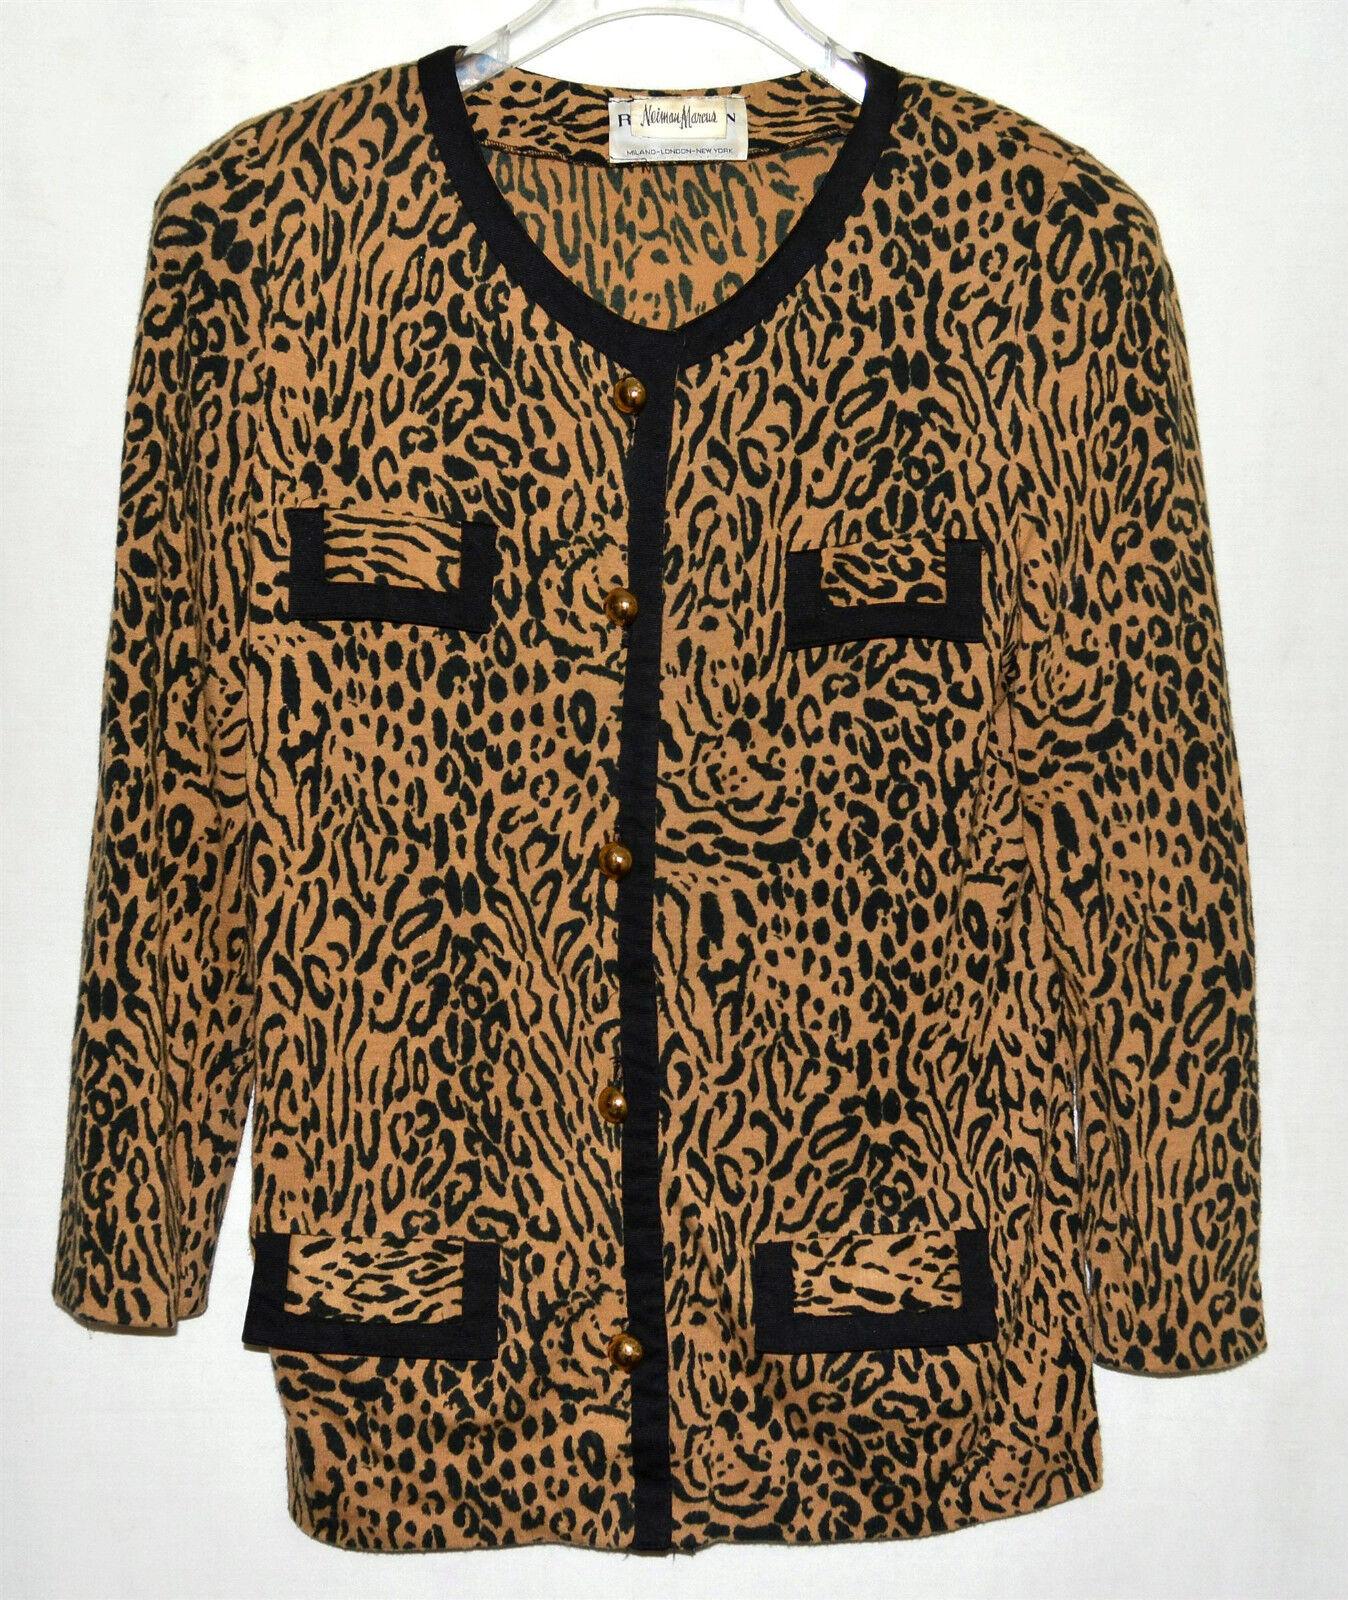 Robert Janan by Eva For Neiman Marcus Faux Leopard Print Blazer Blouse Size M